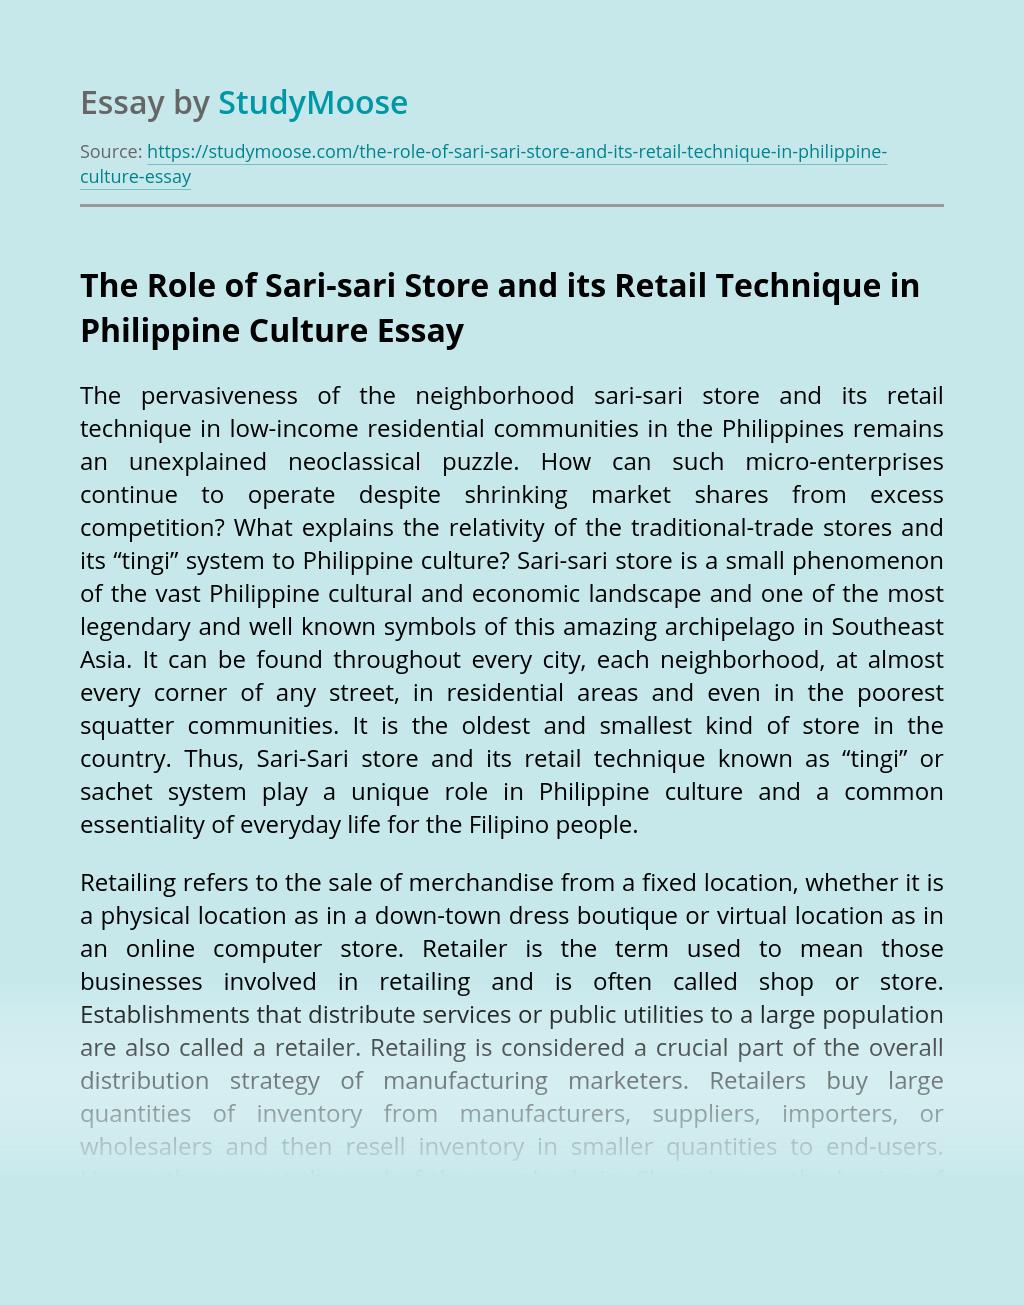 The Role of Sari-sari Store and its Retail Technique in Philippine Culture